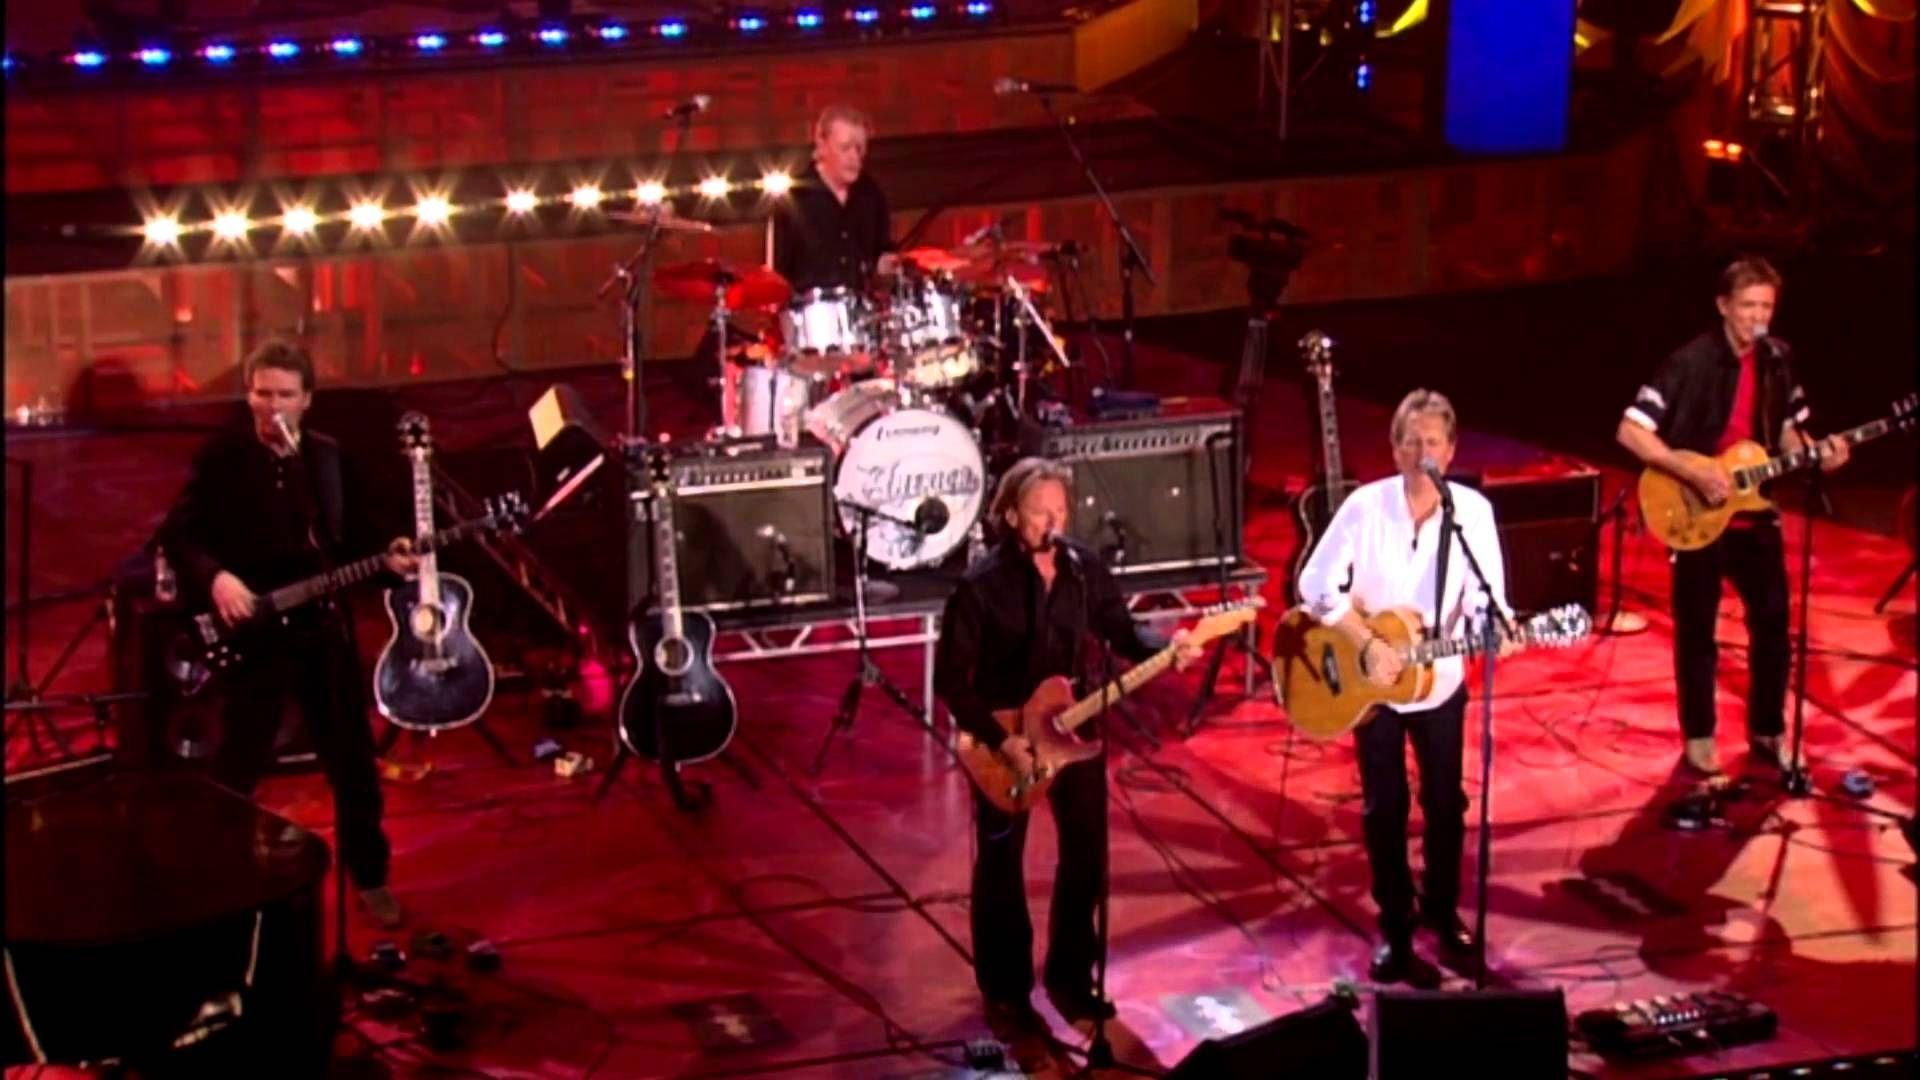 America - Sandman (Live in Chicago) 1080P | Folk Rock | Music